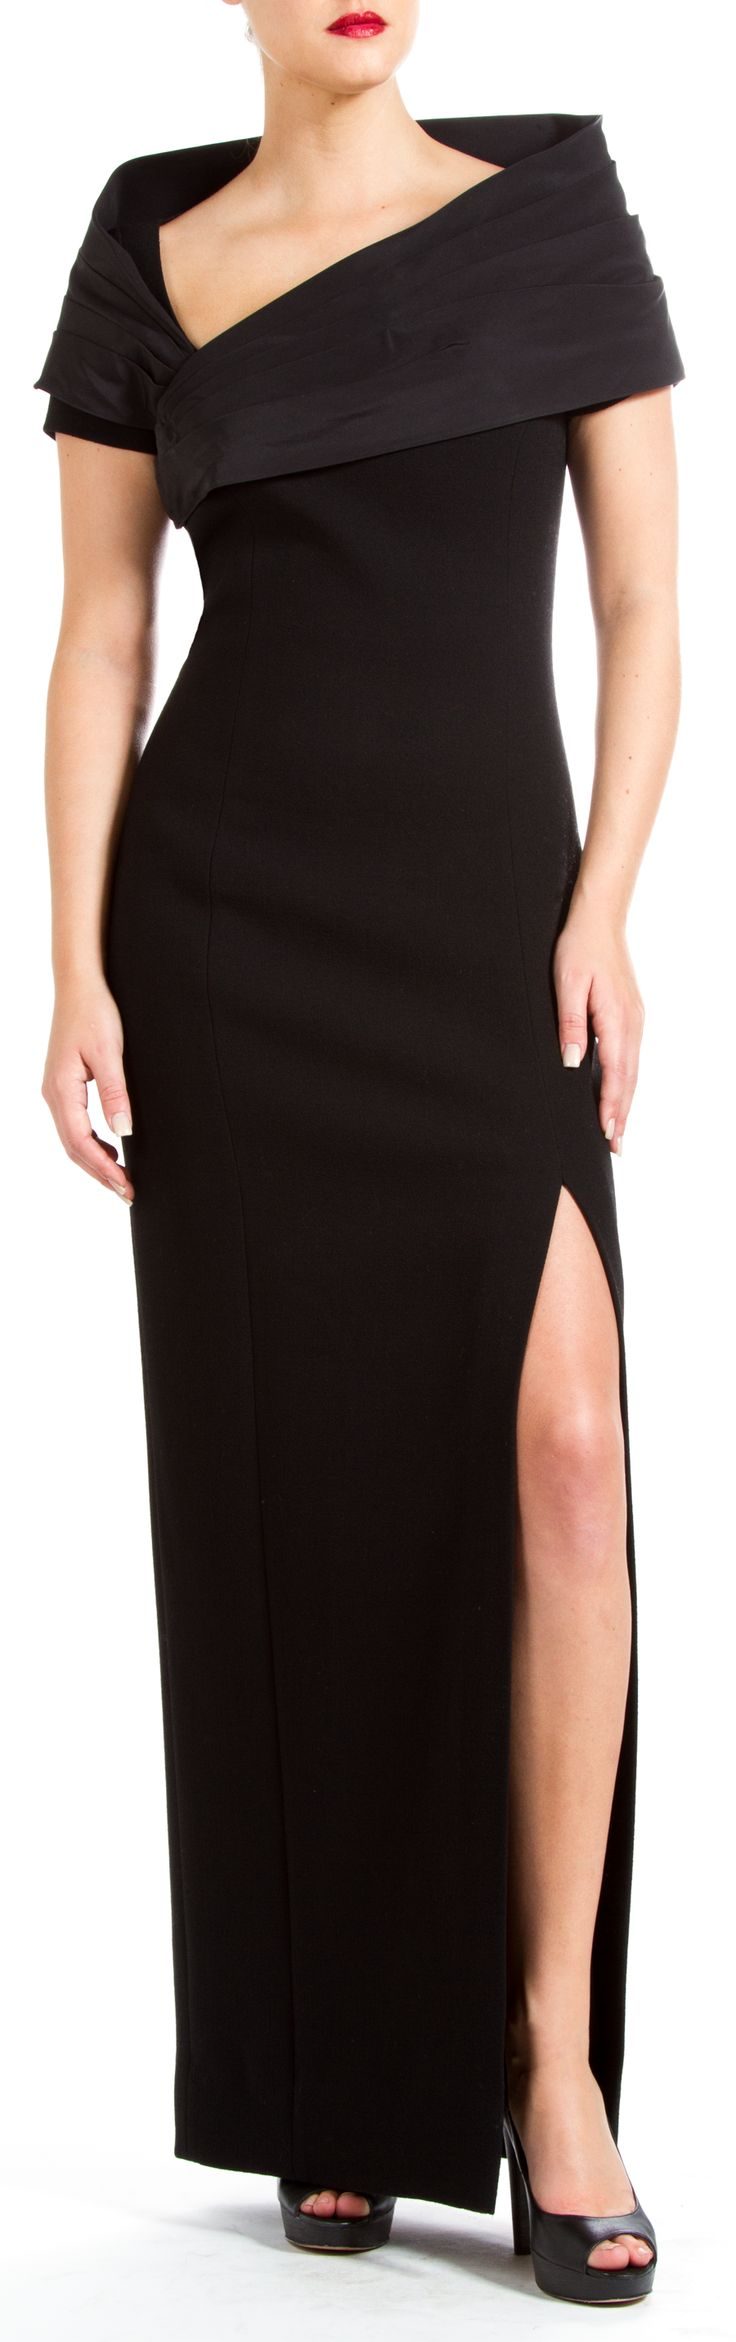 MICHAEL KORS DRESS @Michelle Flynn Flynn Coleman-HERS jaglady